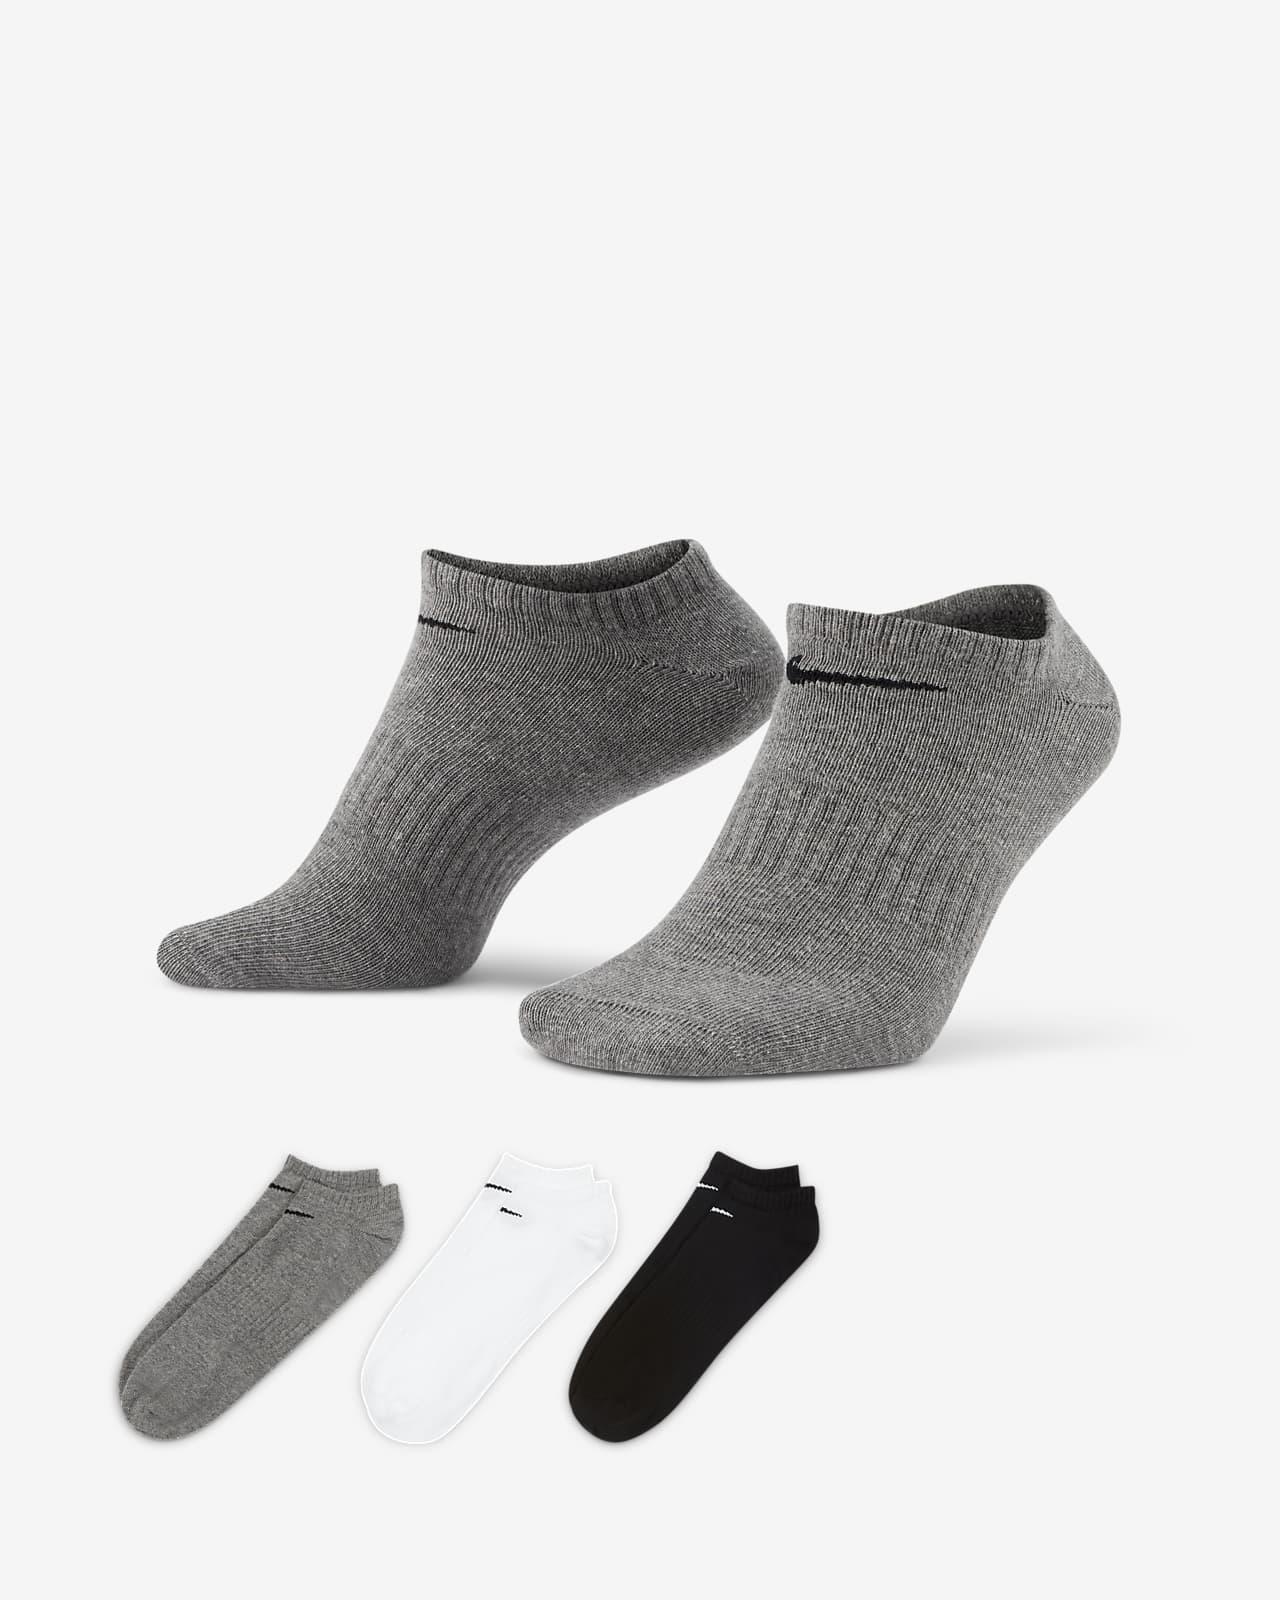 Calcetines de entrenamiento invisibles Nike Everyday Lightweight (3 pares)